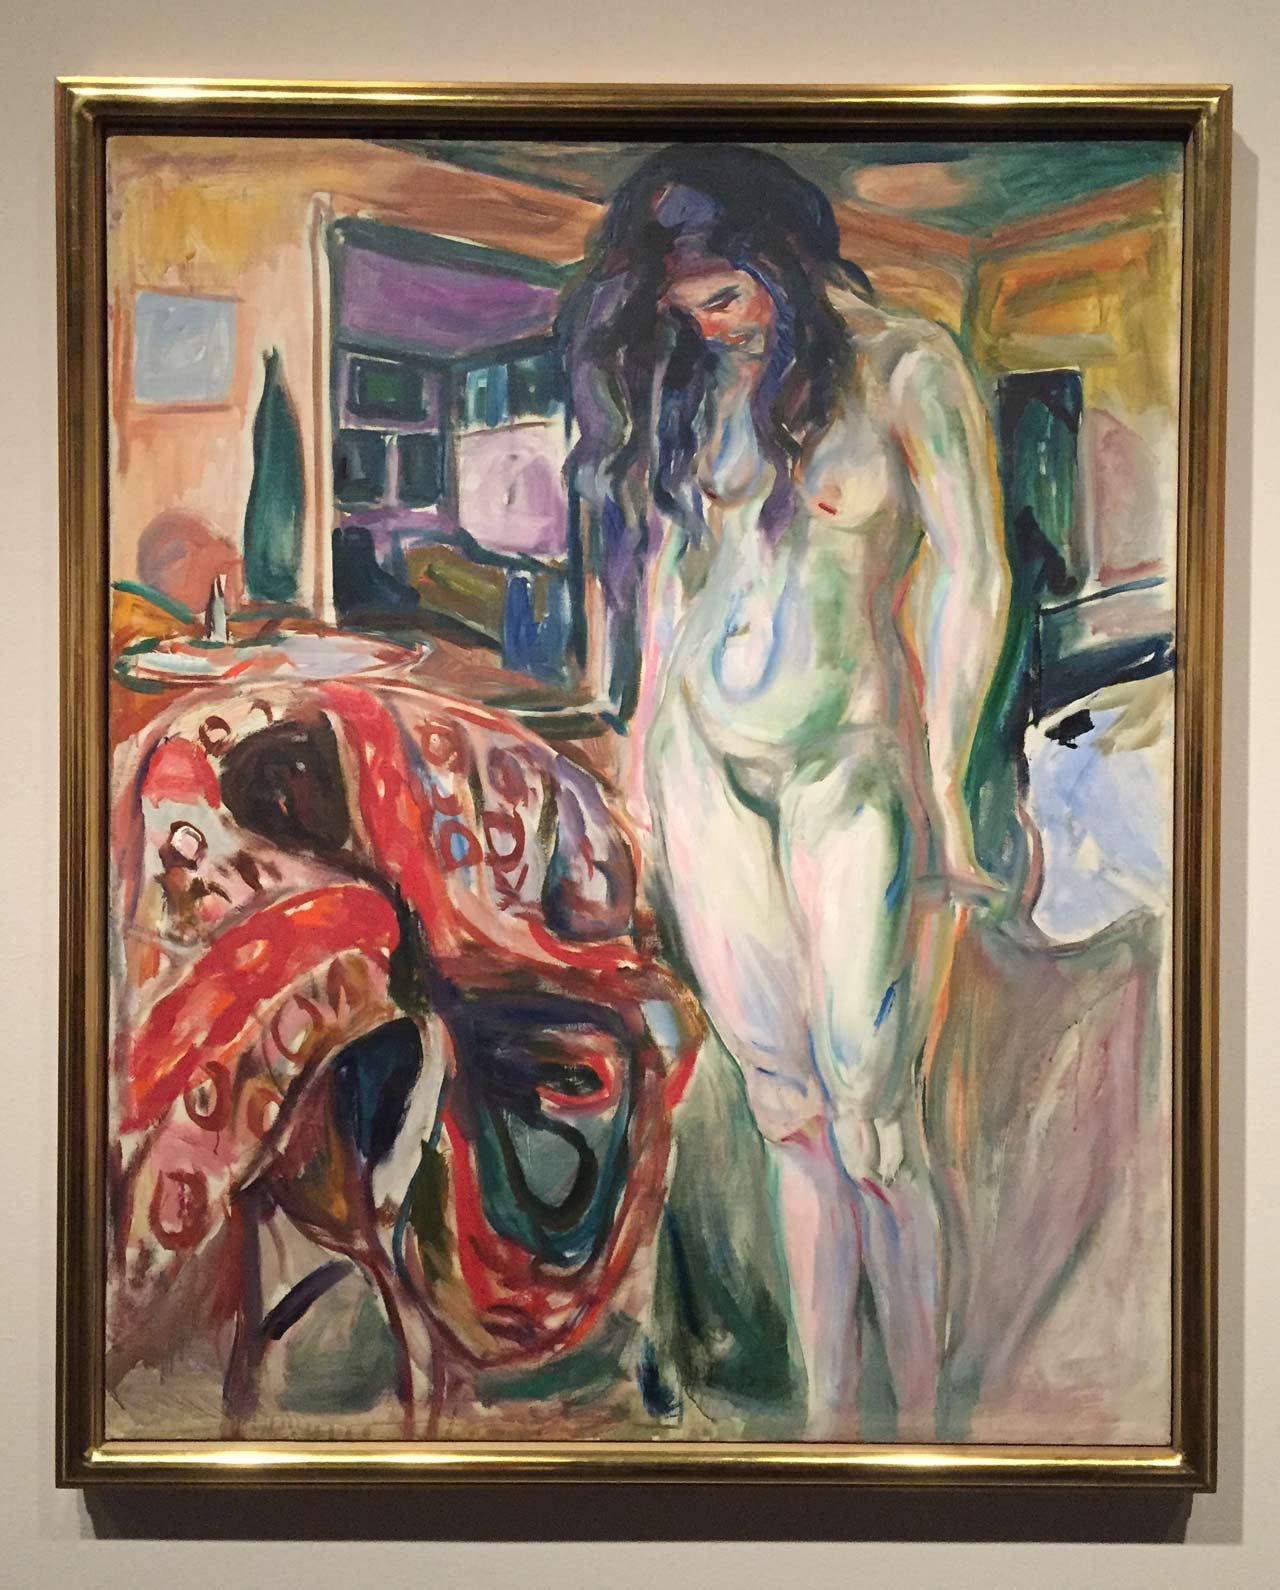 Edvard-Munch-Model-Wicker-Chair-1919-21-Munch-Museum.jpg